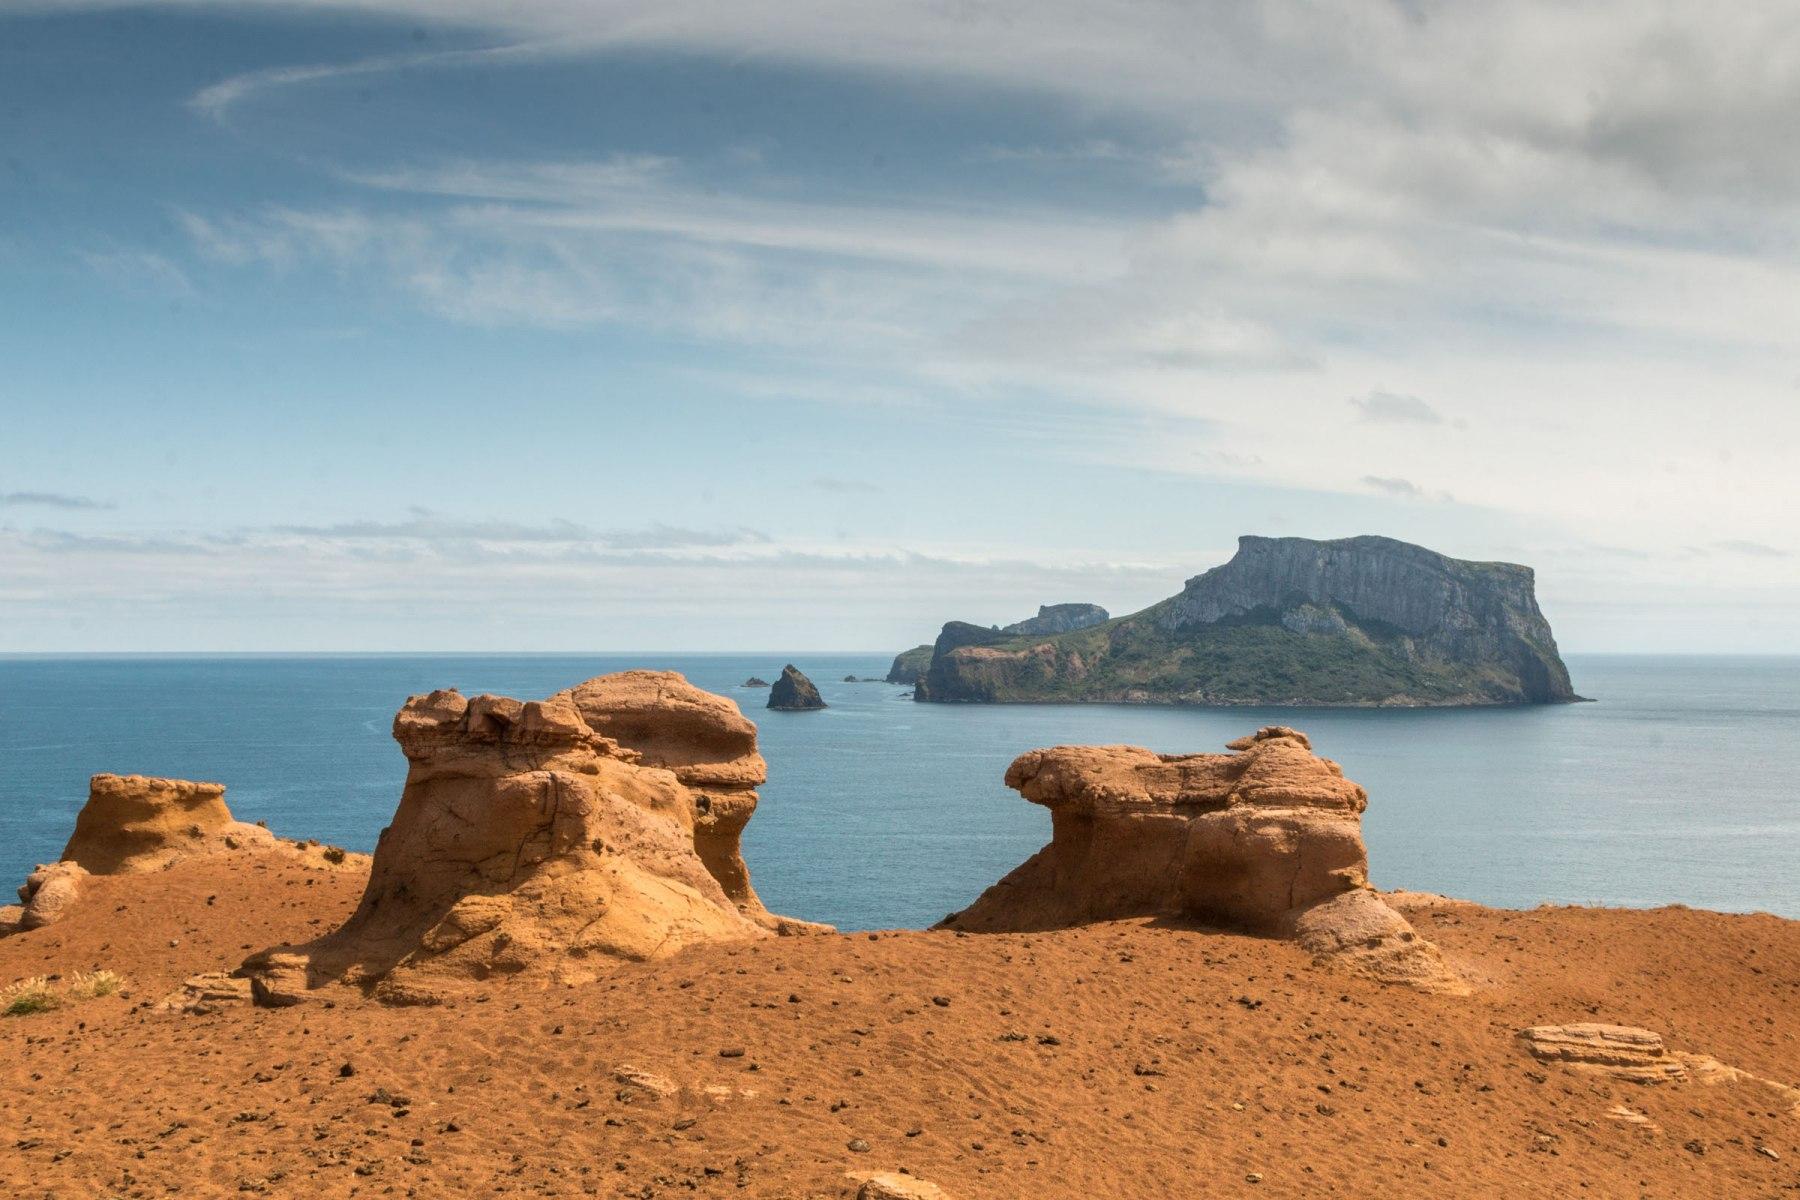 Mars-Lookout-Kokowai-looking-out-to-Mangere-Island-Pitt-Island.-Photo-Doreen-Batchelor